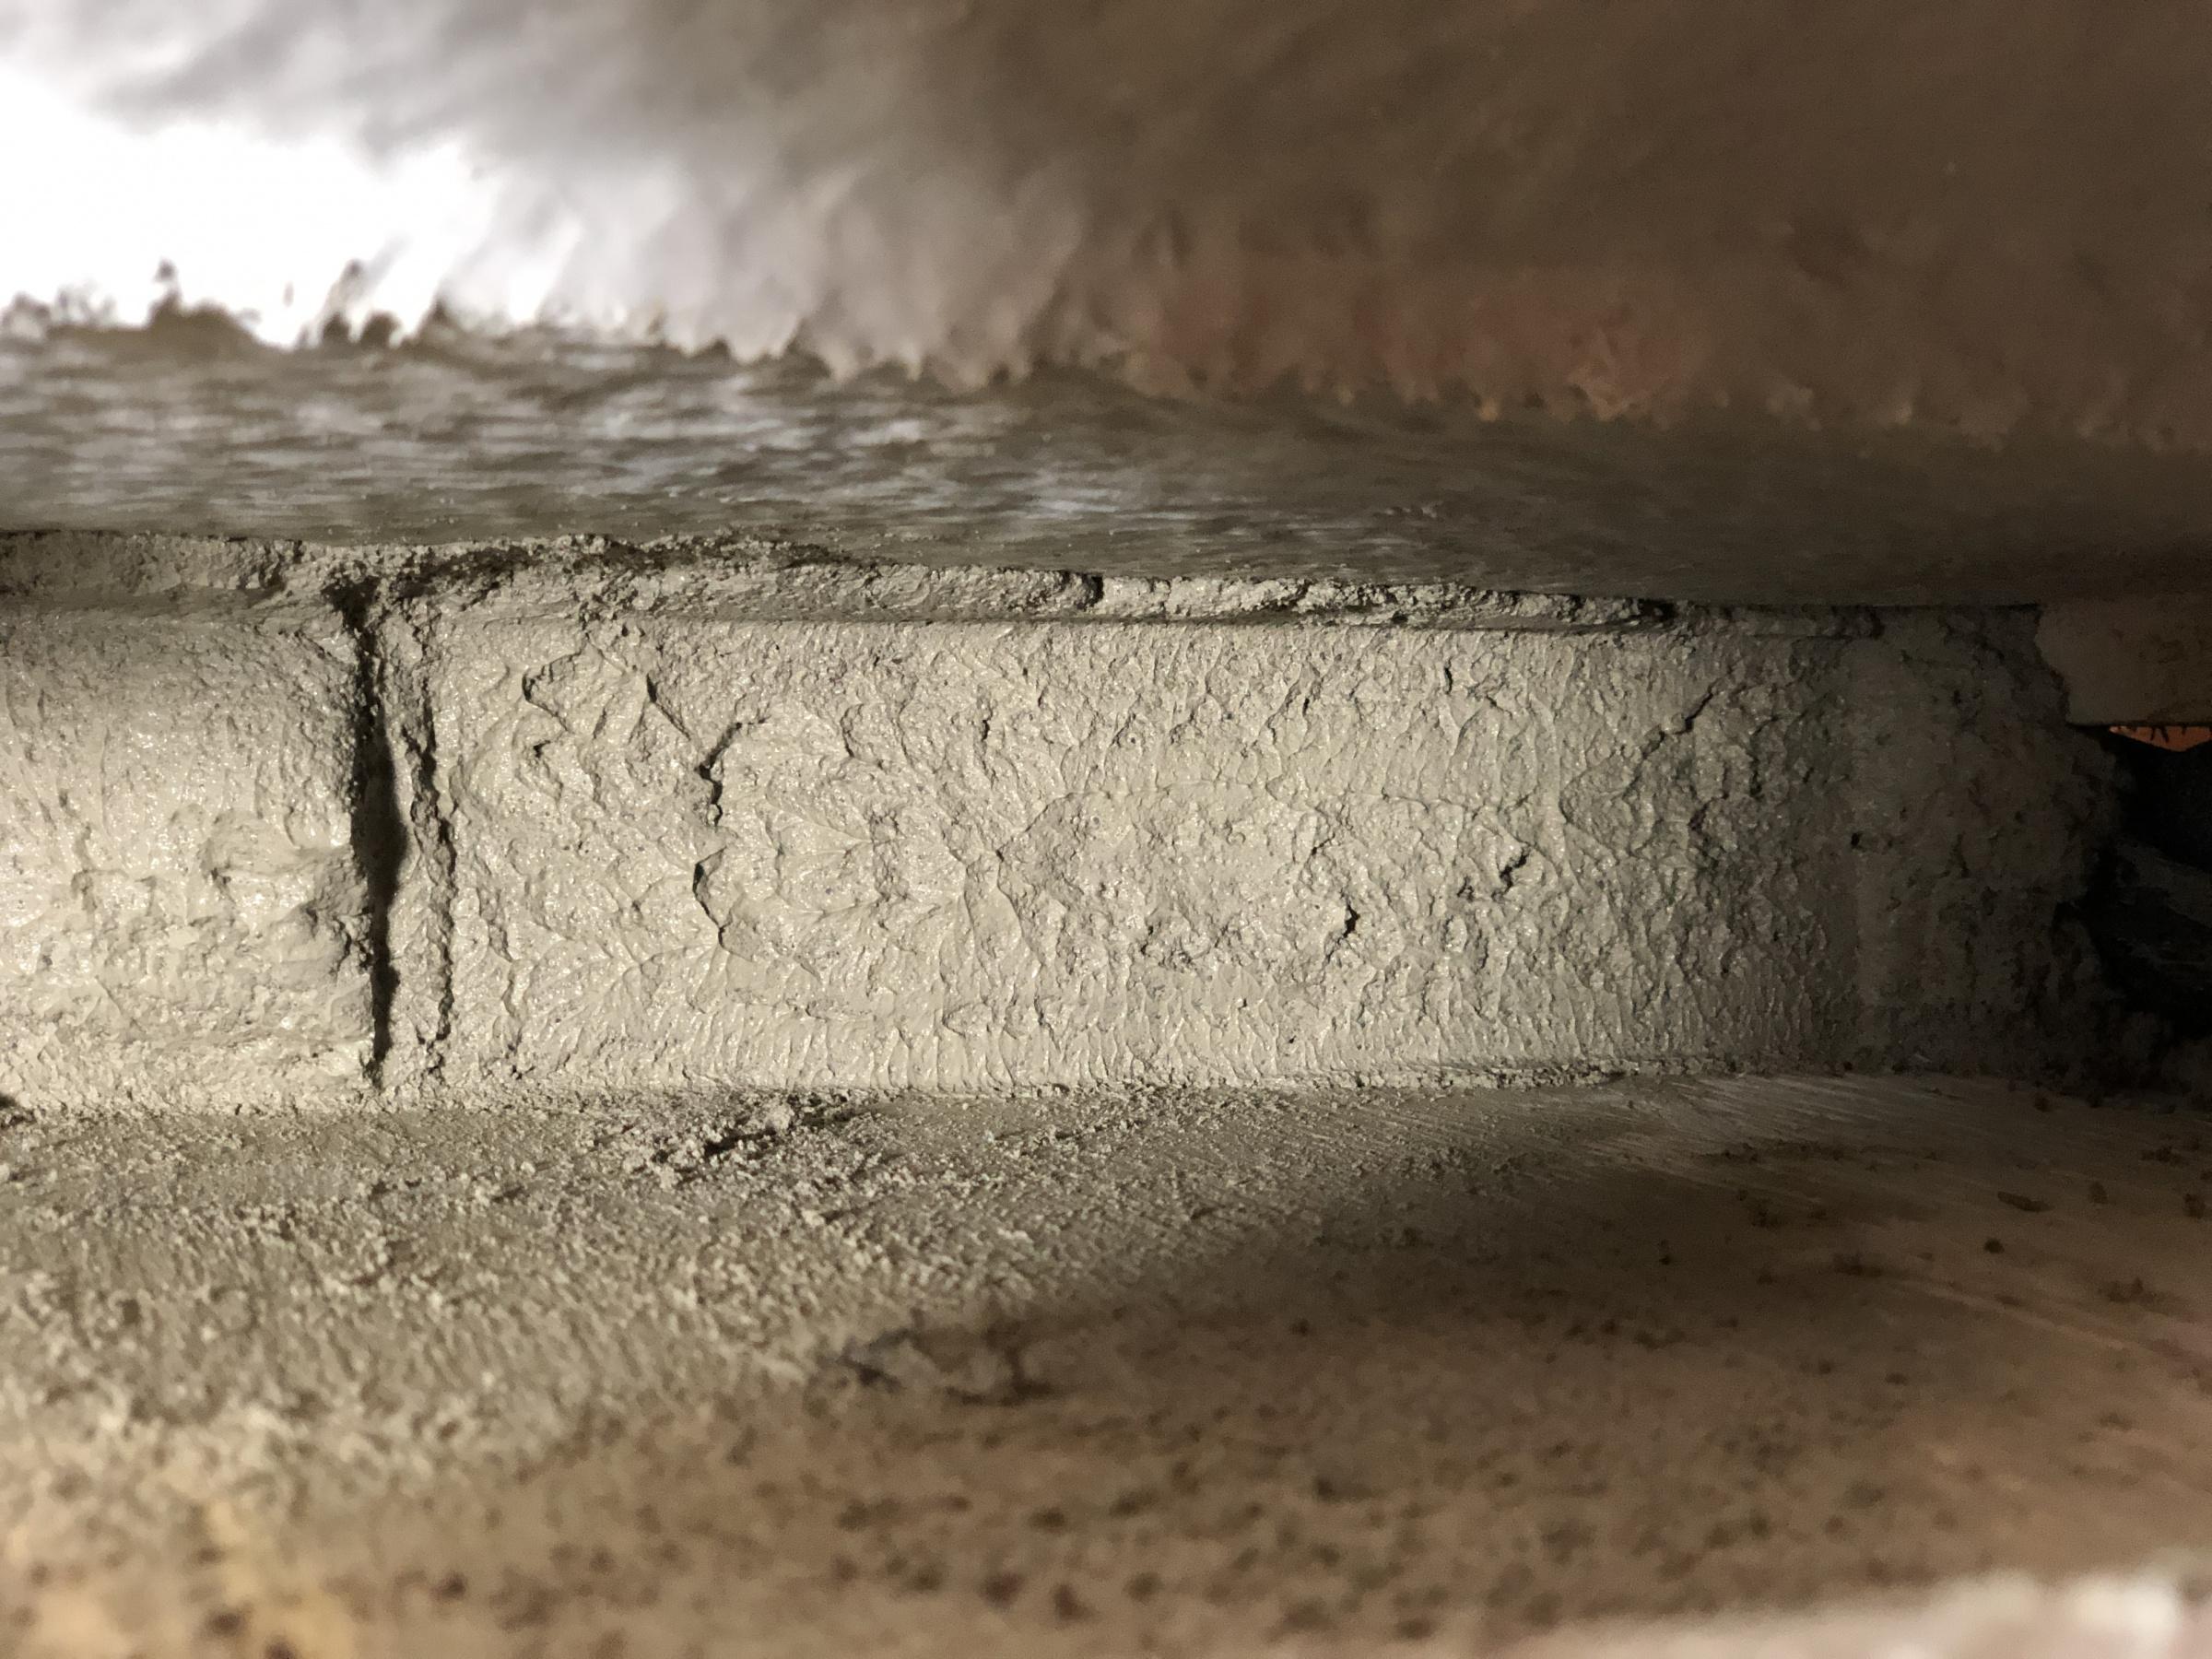 Bath tub bedding: mortar or foam or...? (after tub in place/installed)-img_4066.jpg